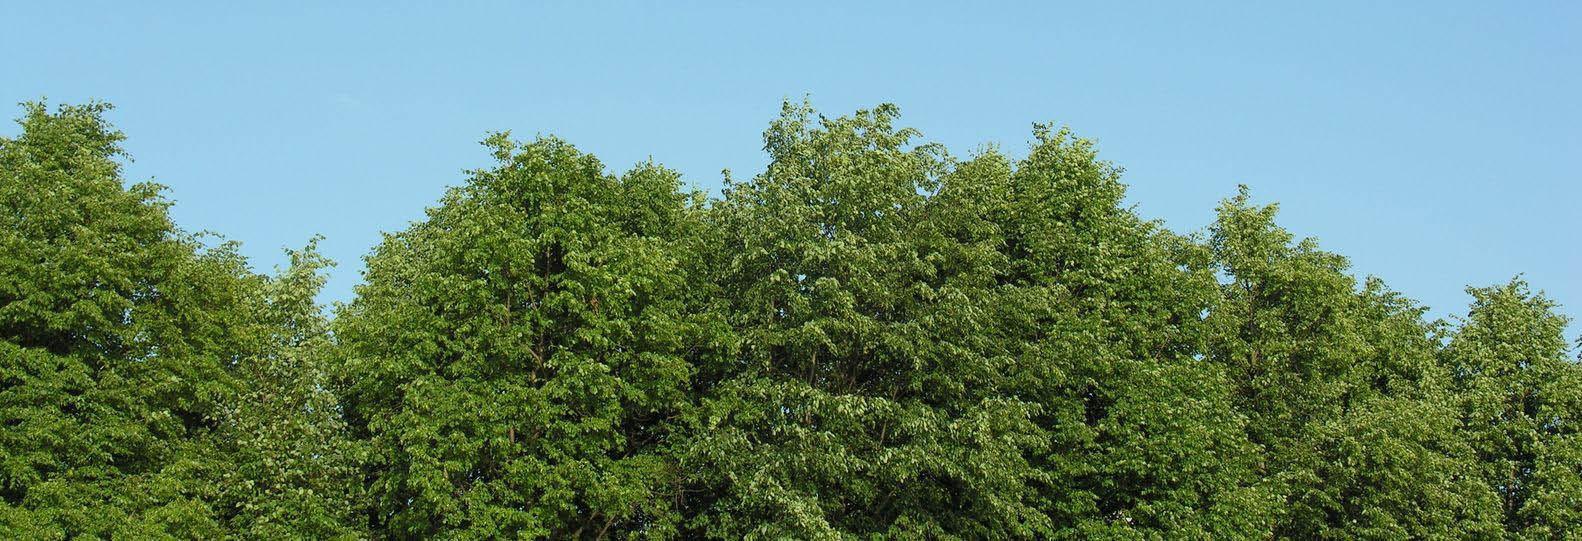 Kingkiner Tree Service, PA, NJ, DE. Tree Removal, Stump Grinding, Pruning, tree coupon